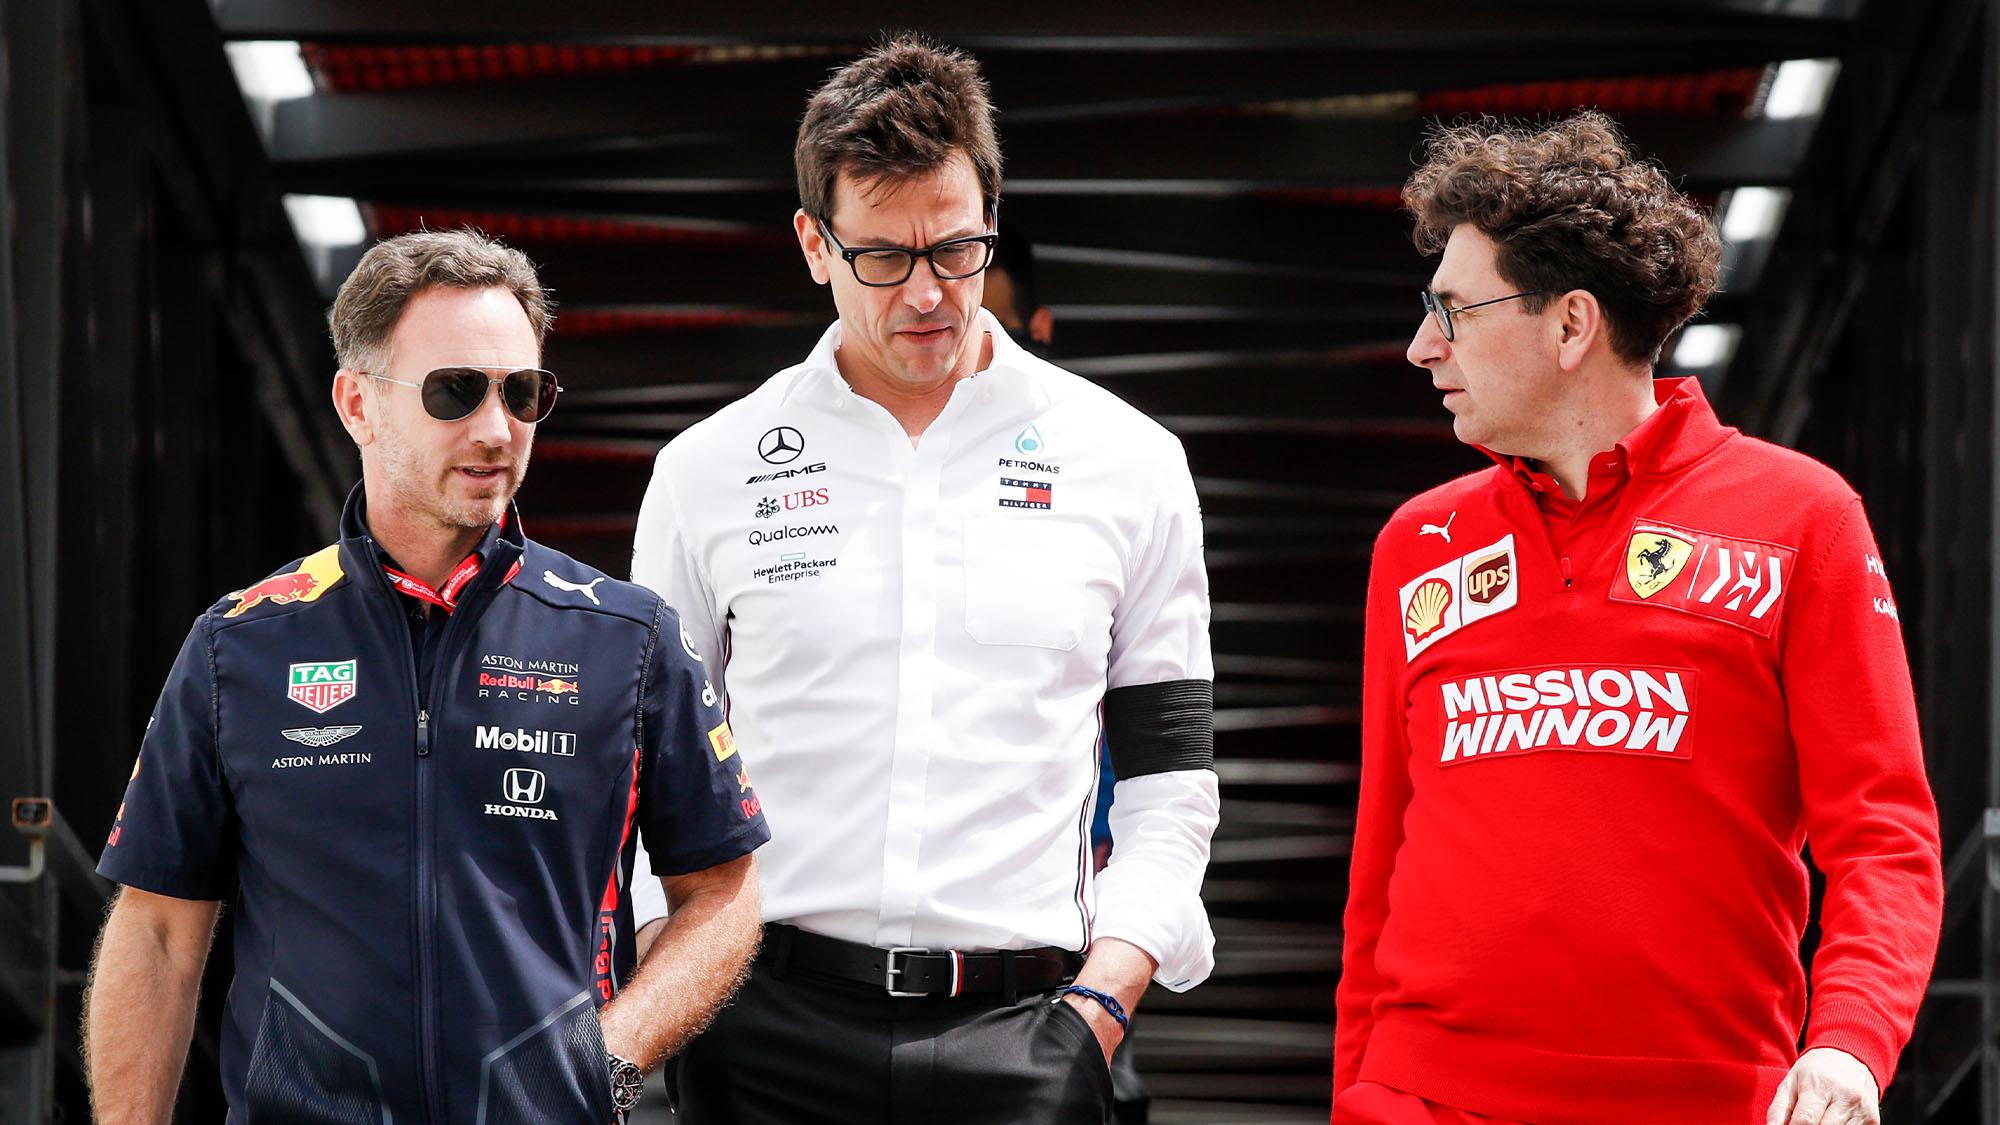 Ferrari GPS has identified the origin of Honda's recent power increase